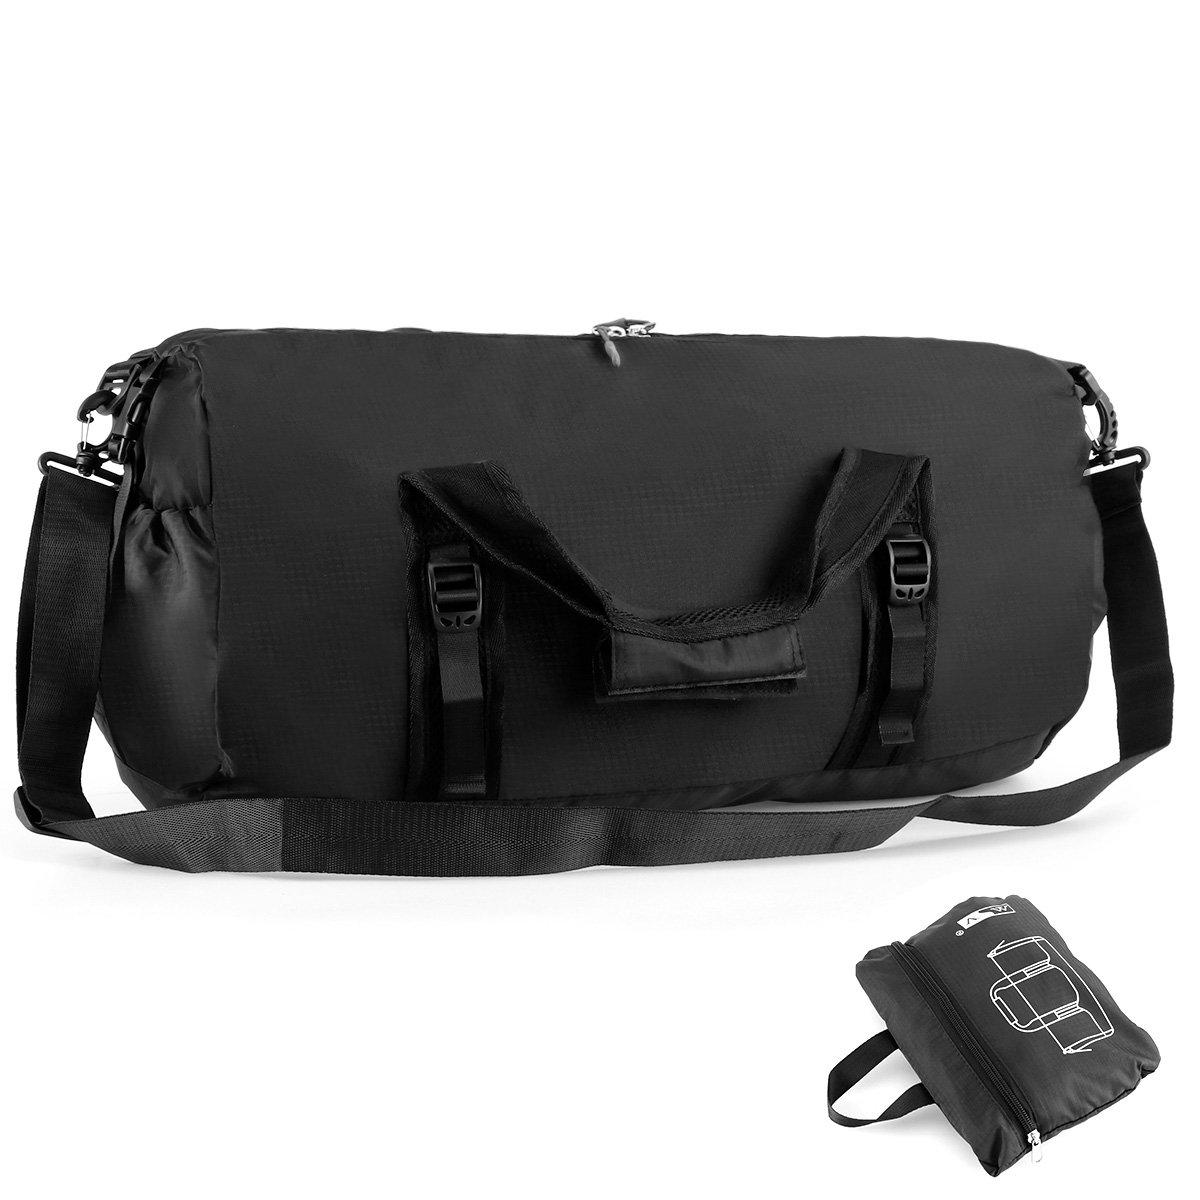 Duffel Bag Travelling Bag Large Capacity Luggage Bag Foldable Zipper Handbag Single-shoulder Bag Crossbody Bag for Men and Women (Small)